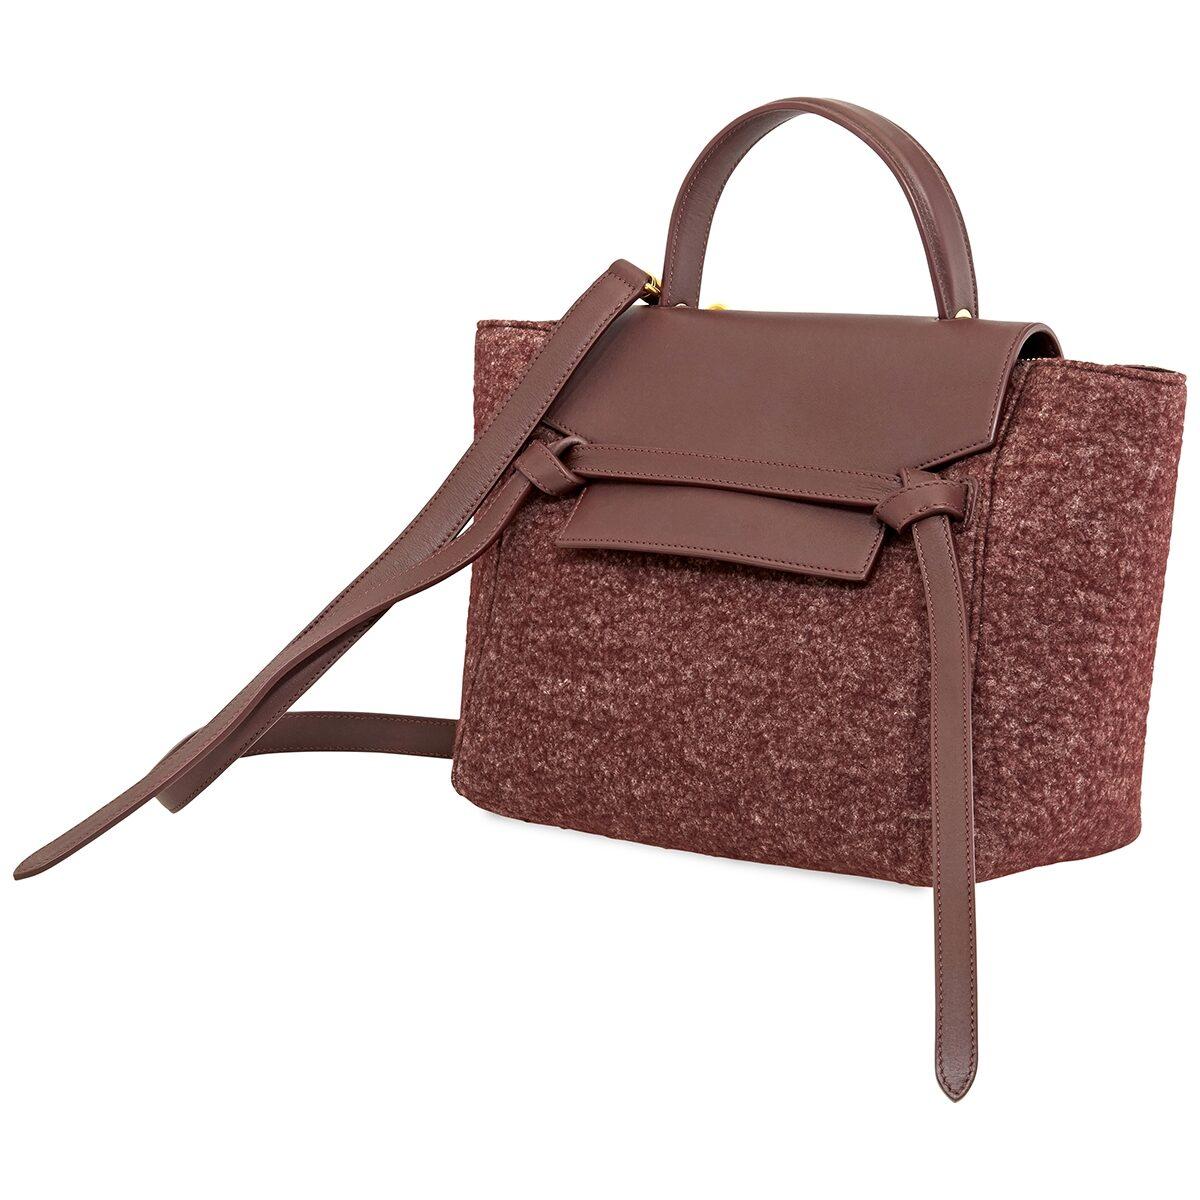 Celine Ladies Plum Micro Belt Bag 180152aun 28ru Handbags Celine Jomashop